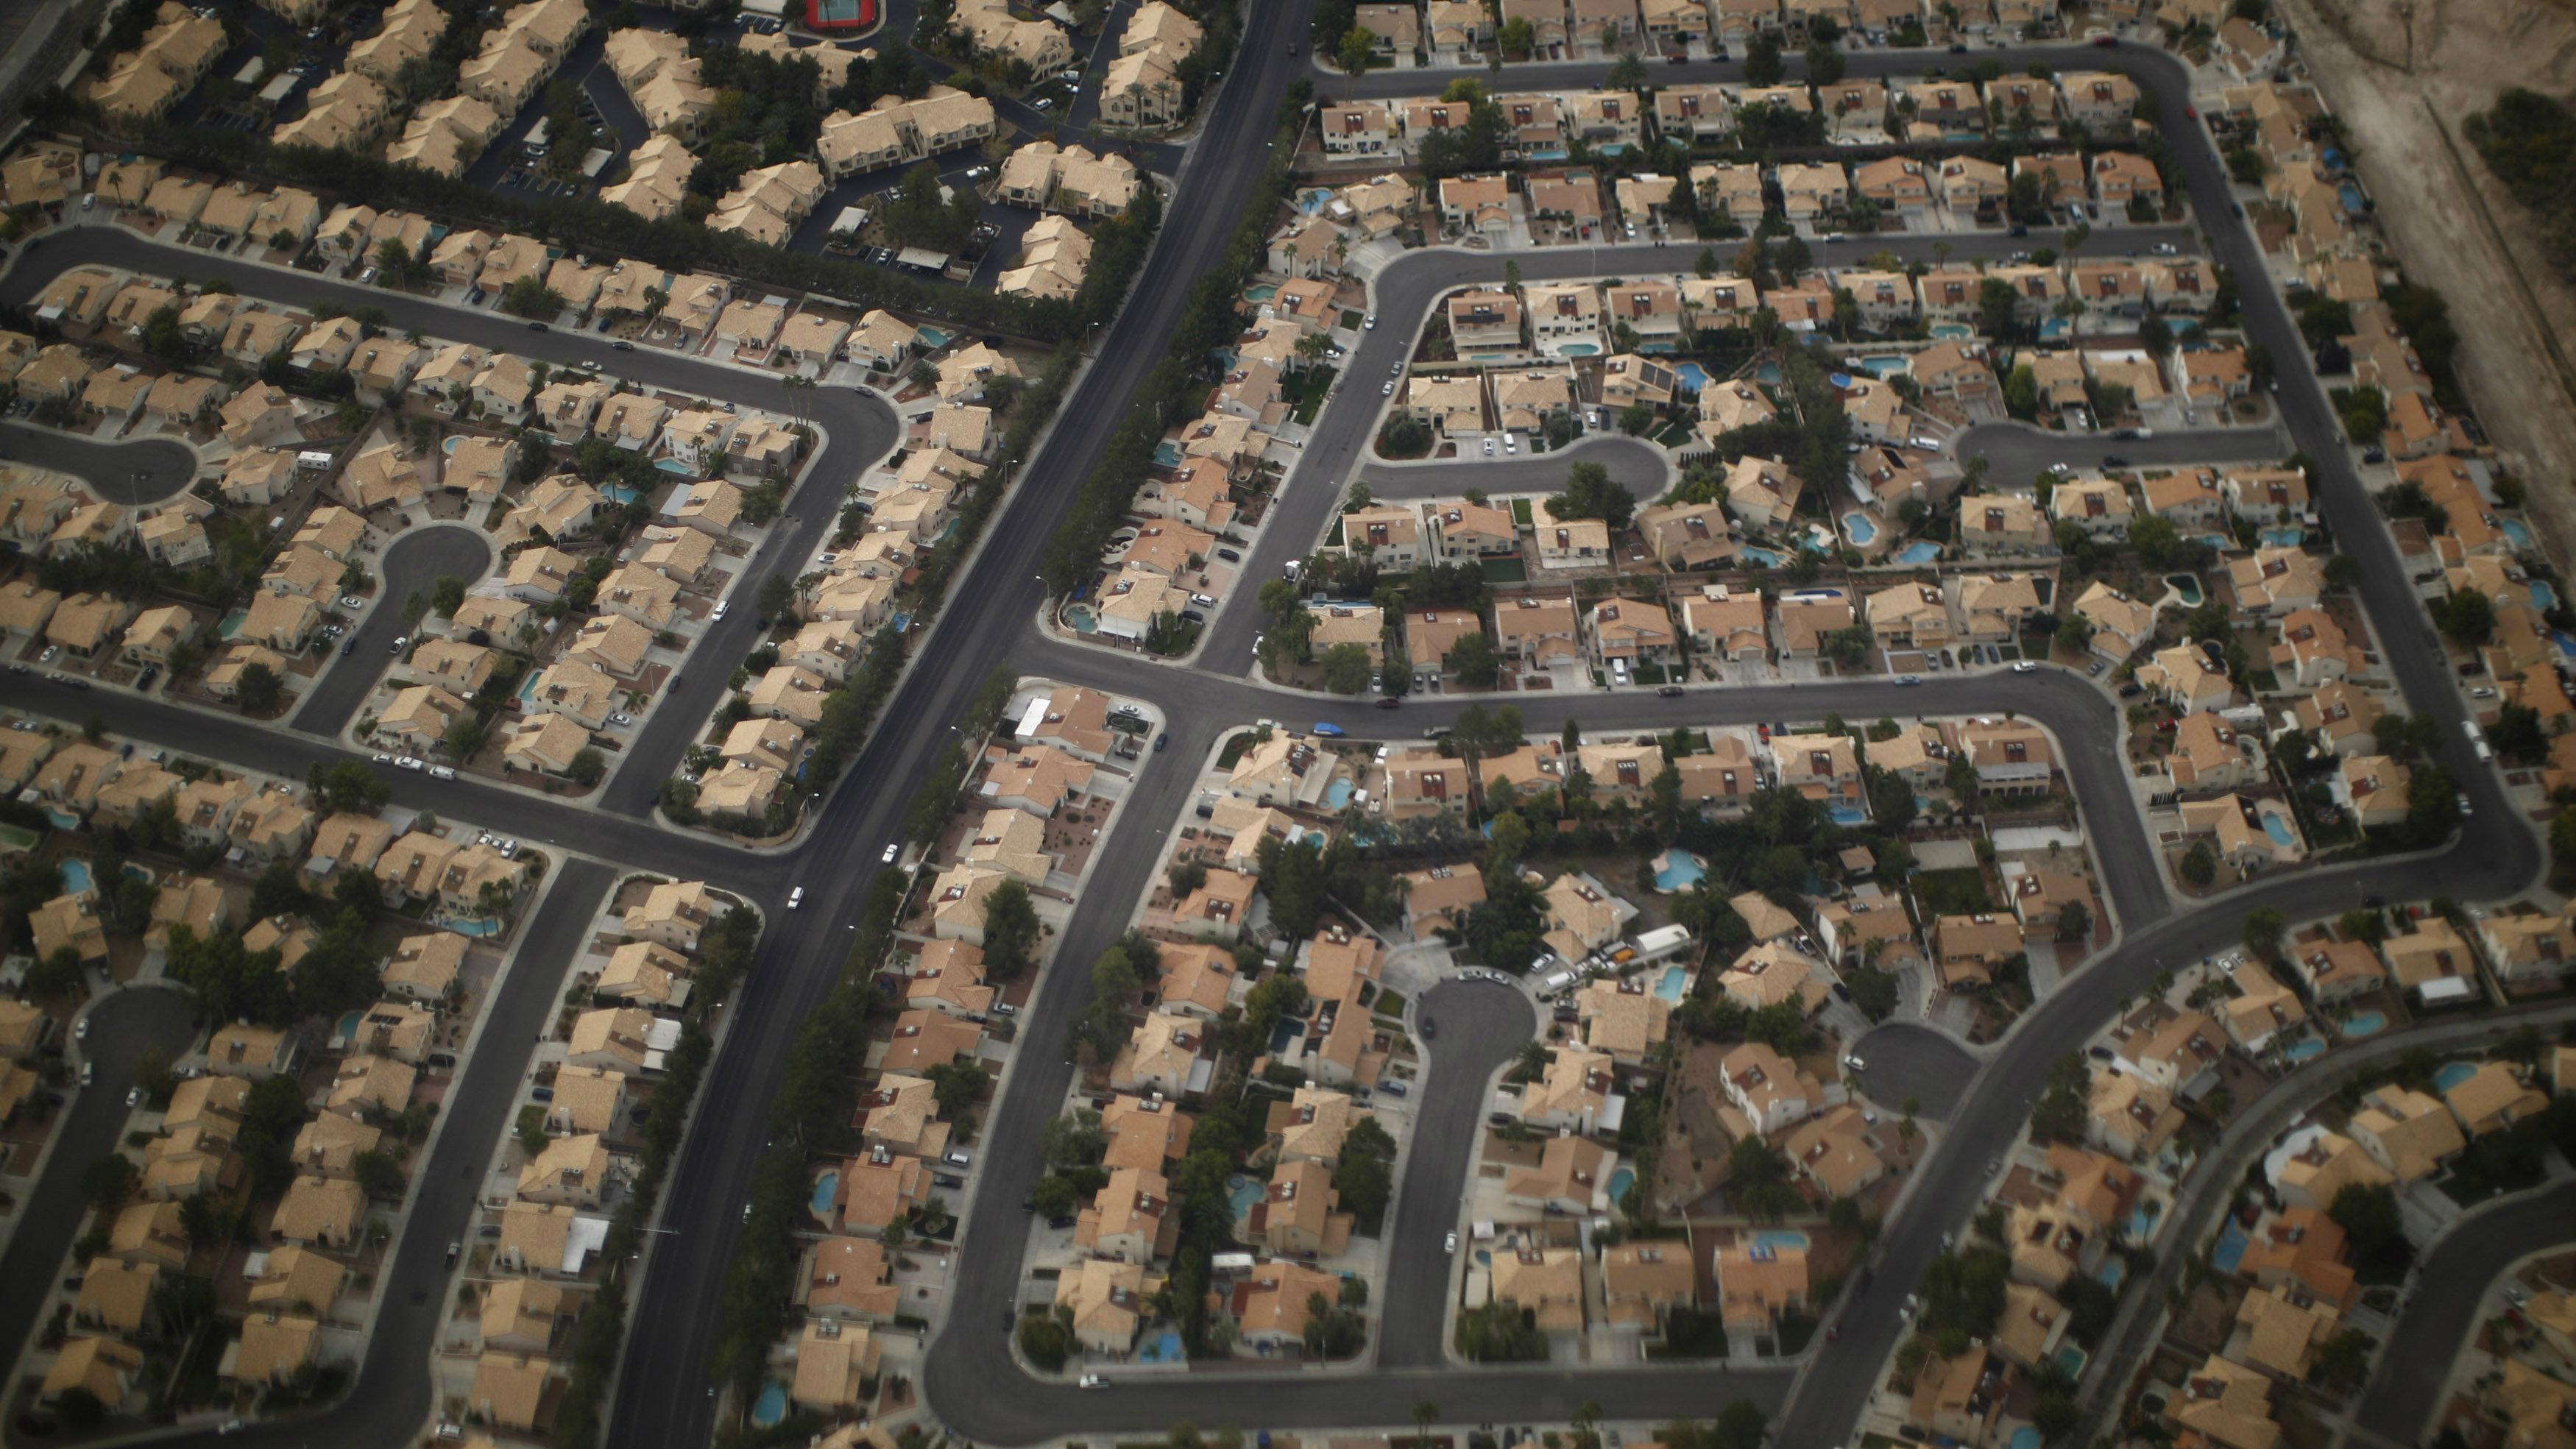 Overhead shot of rural Las Vegas.